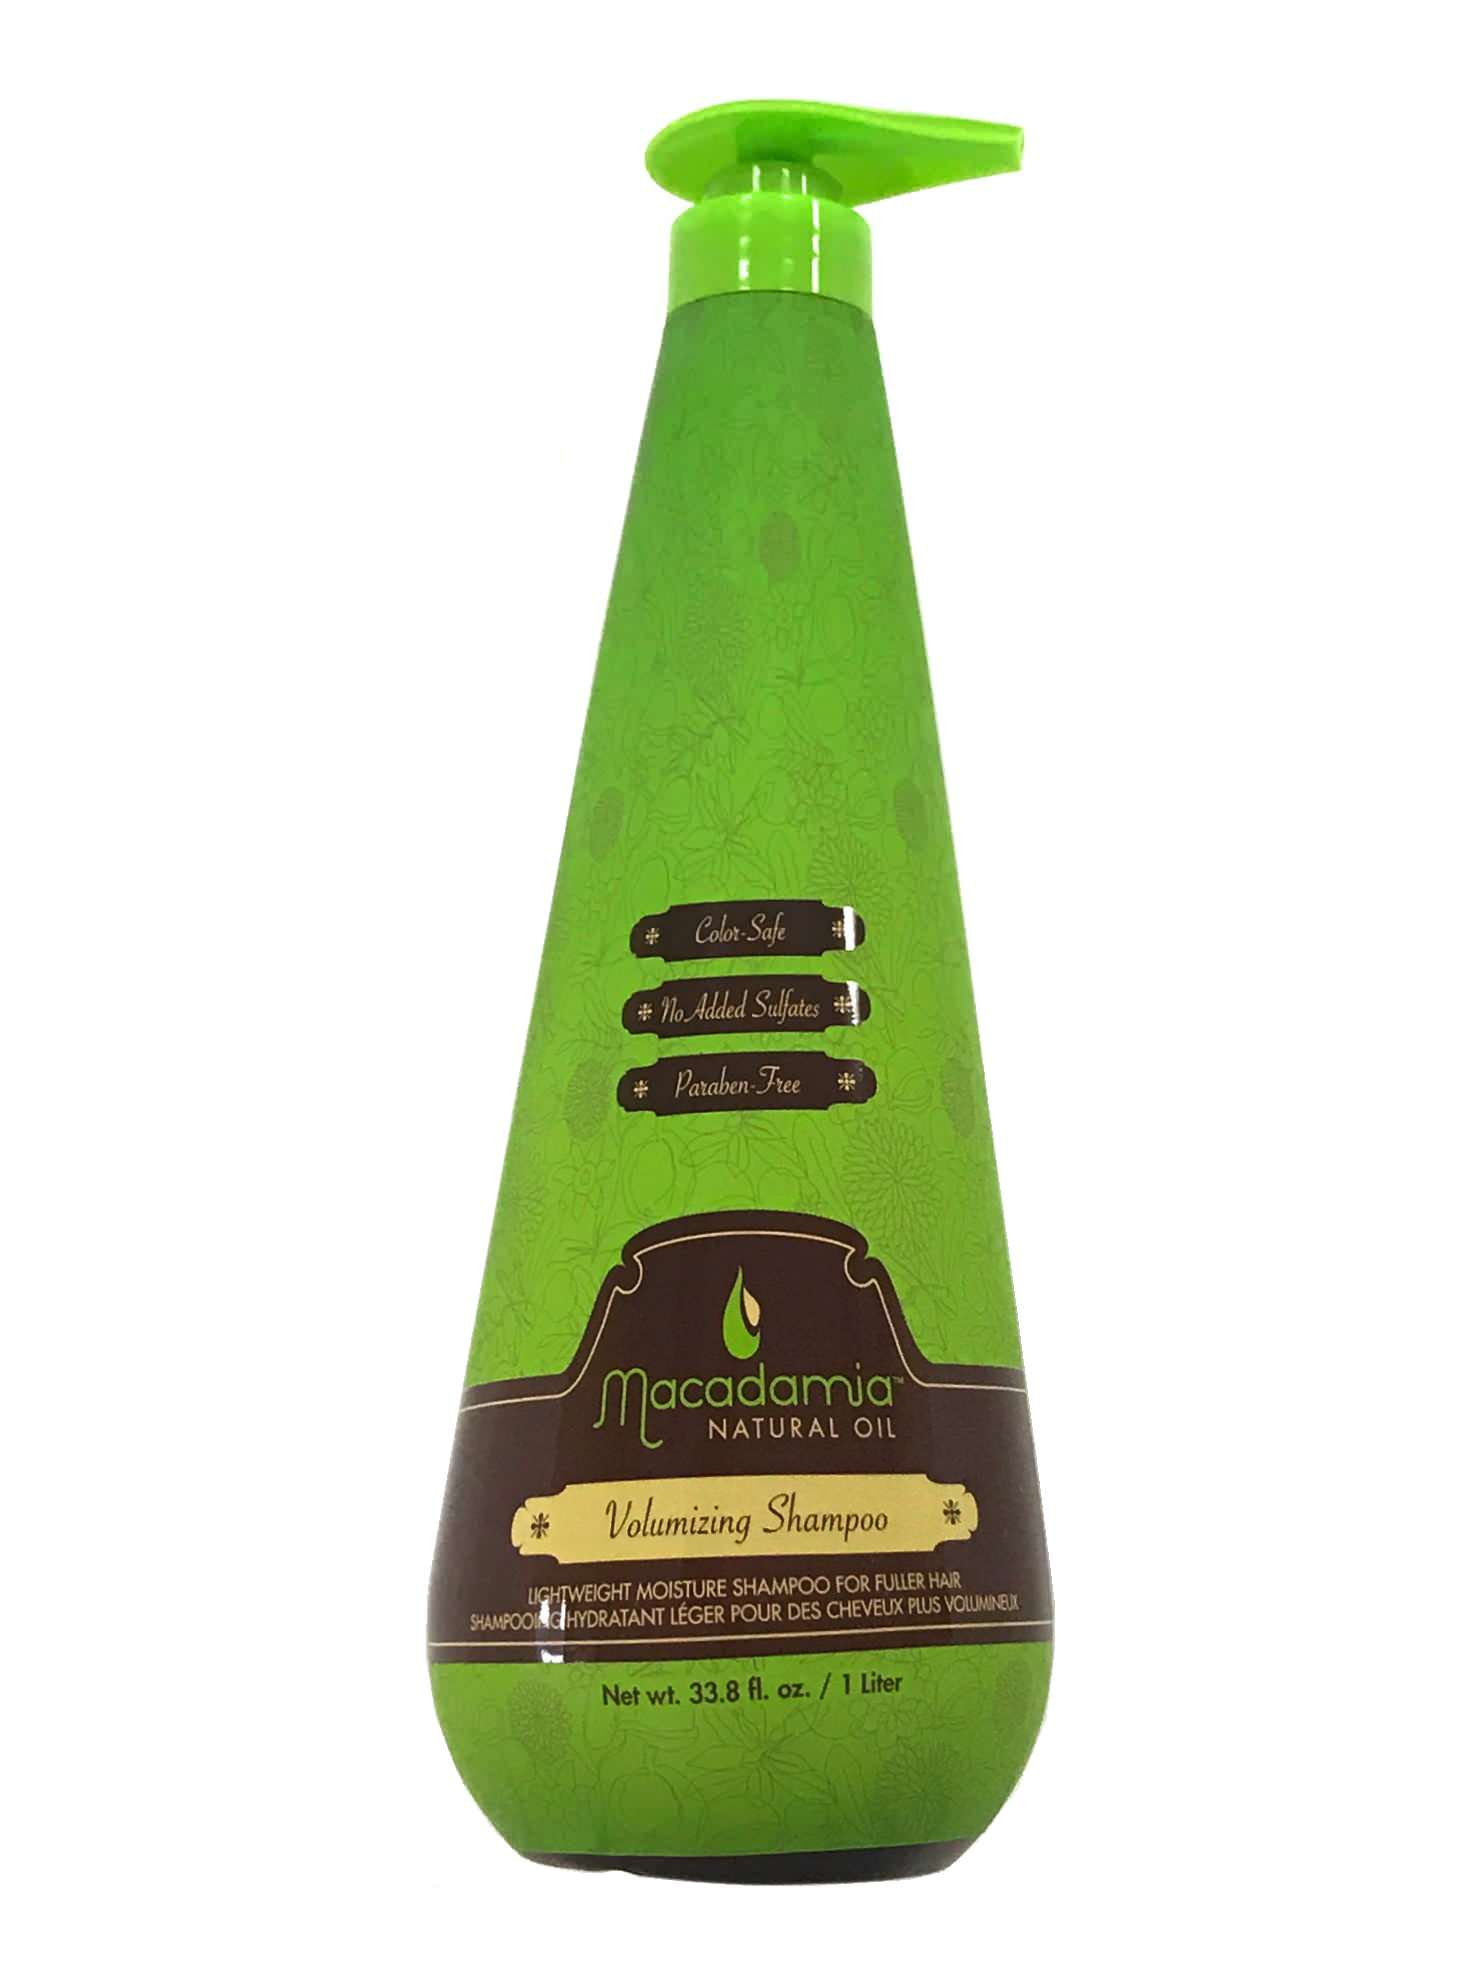 Macadamia Hair Care Volumizing Shampoo 33.8 oz